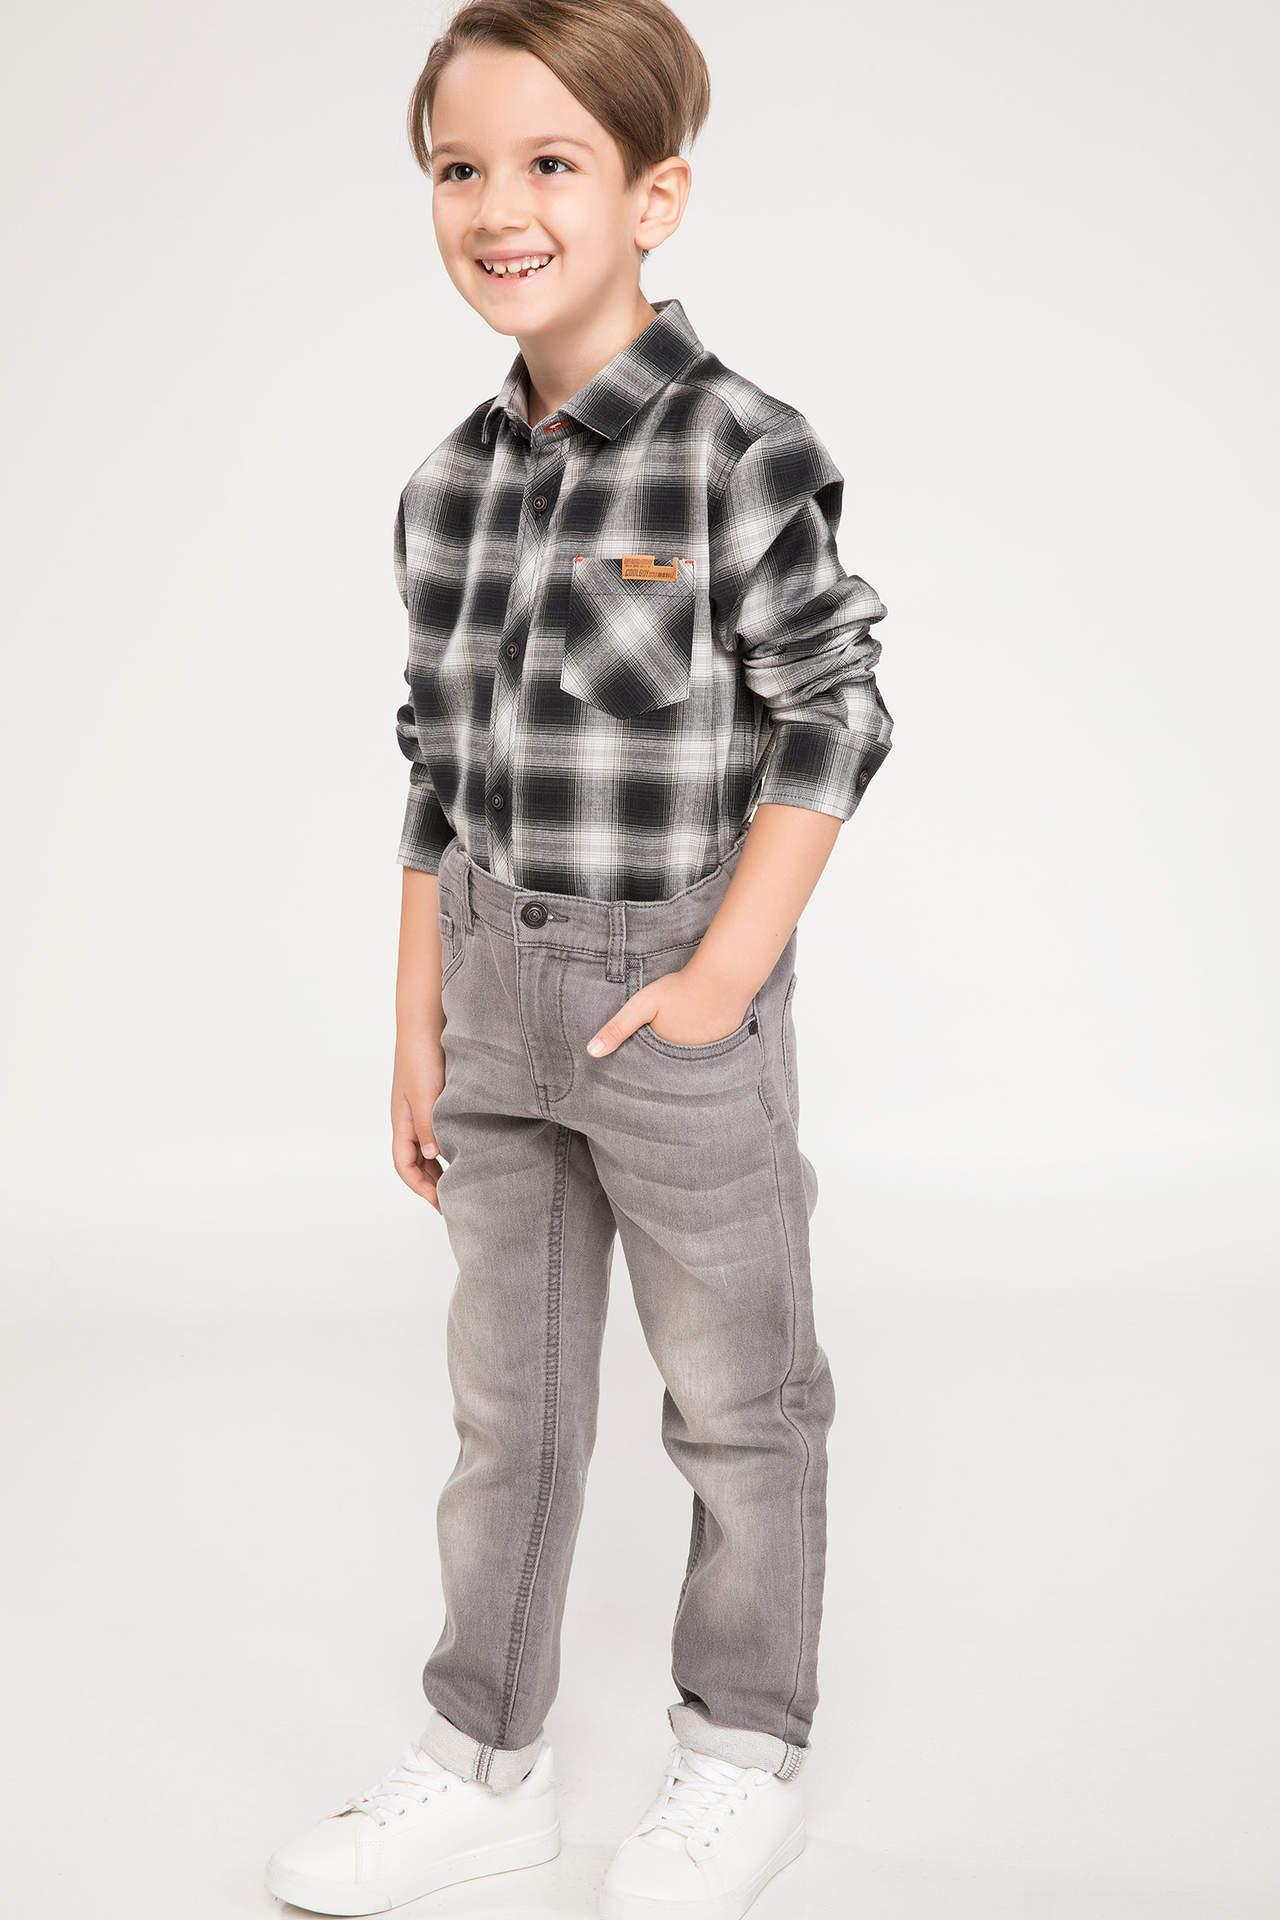 DeFacto Erkek Çocuk Slim Fit Jean Pantolon Gri male